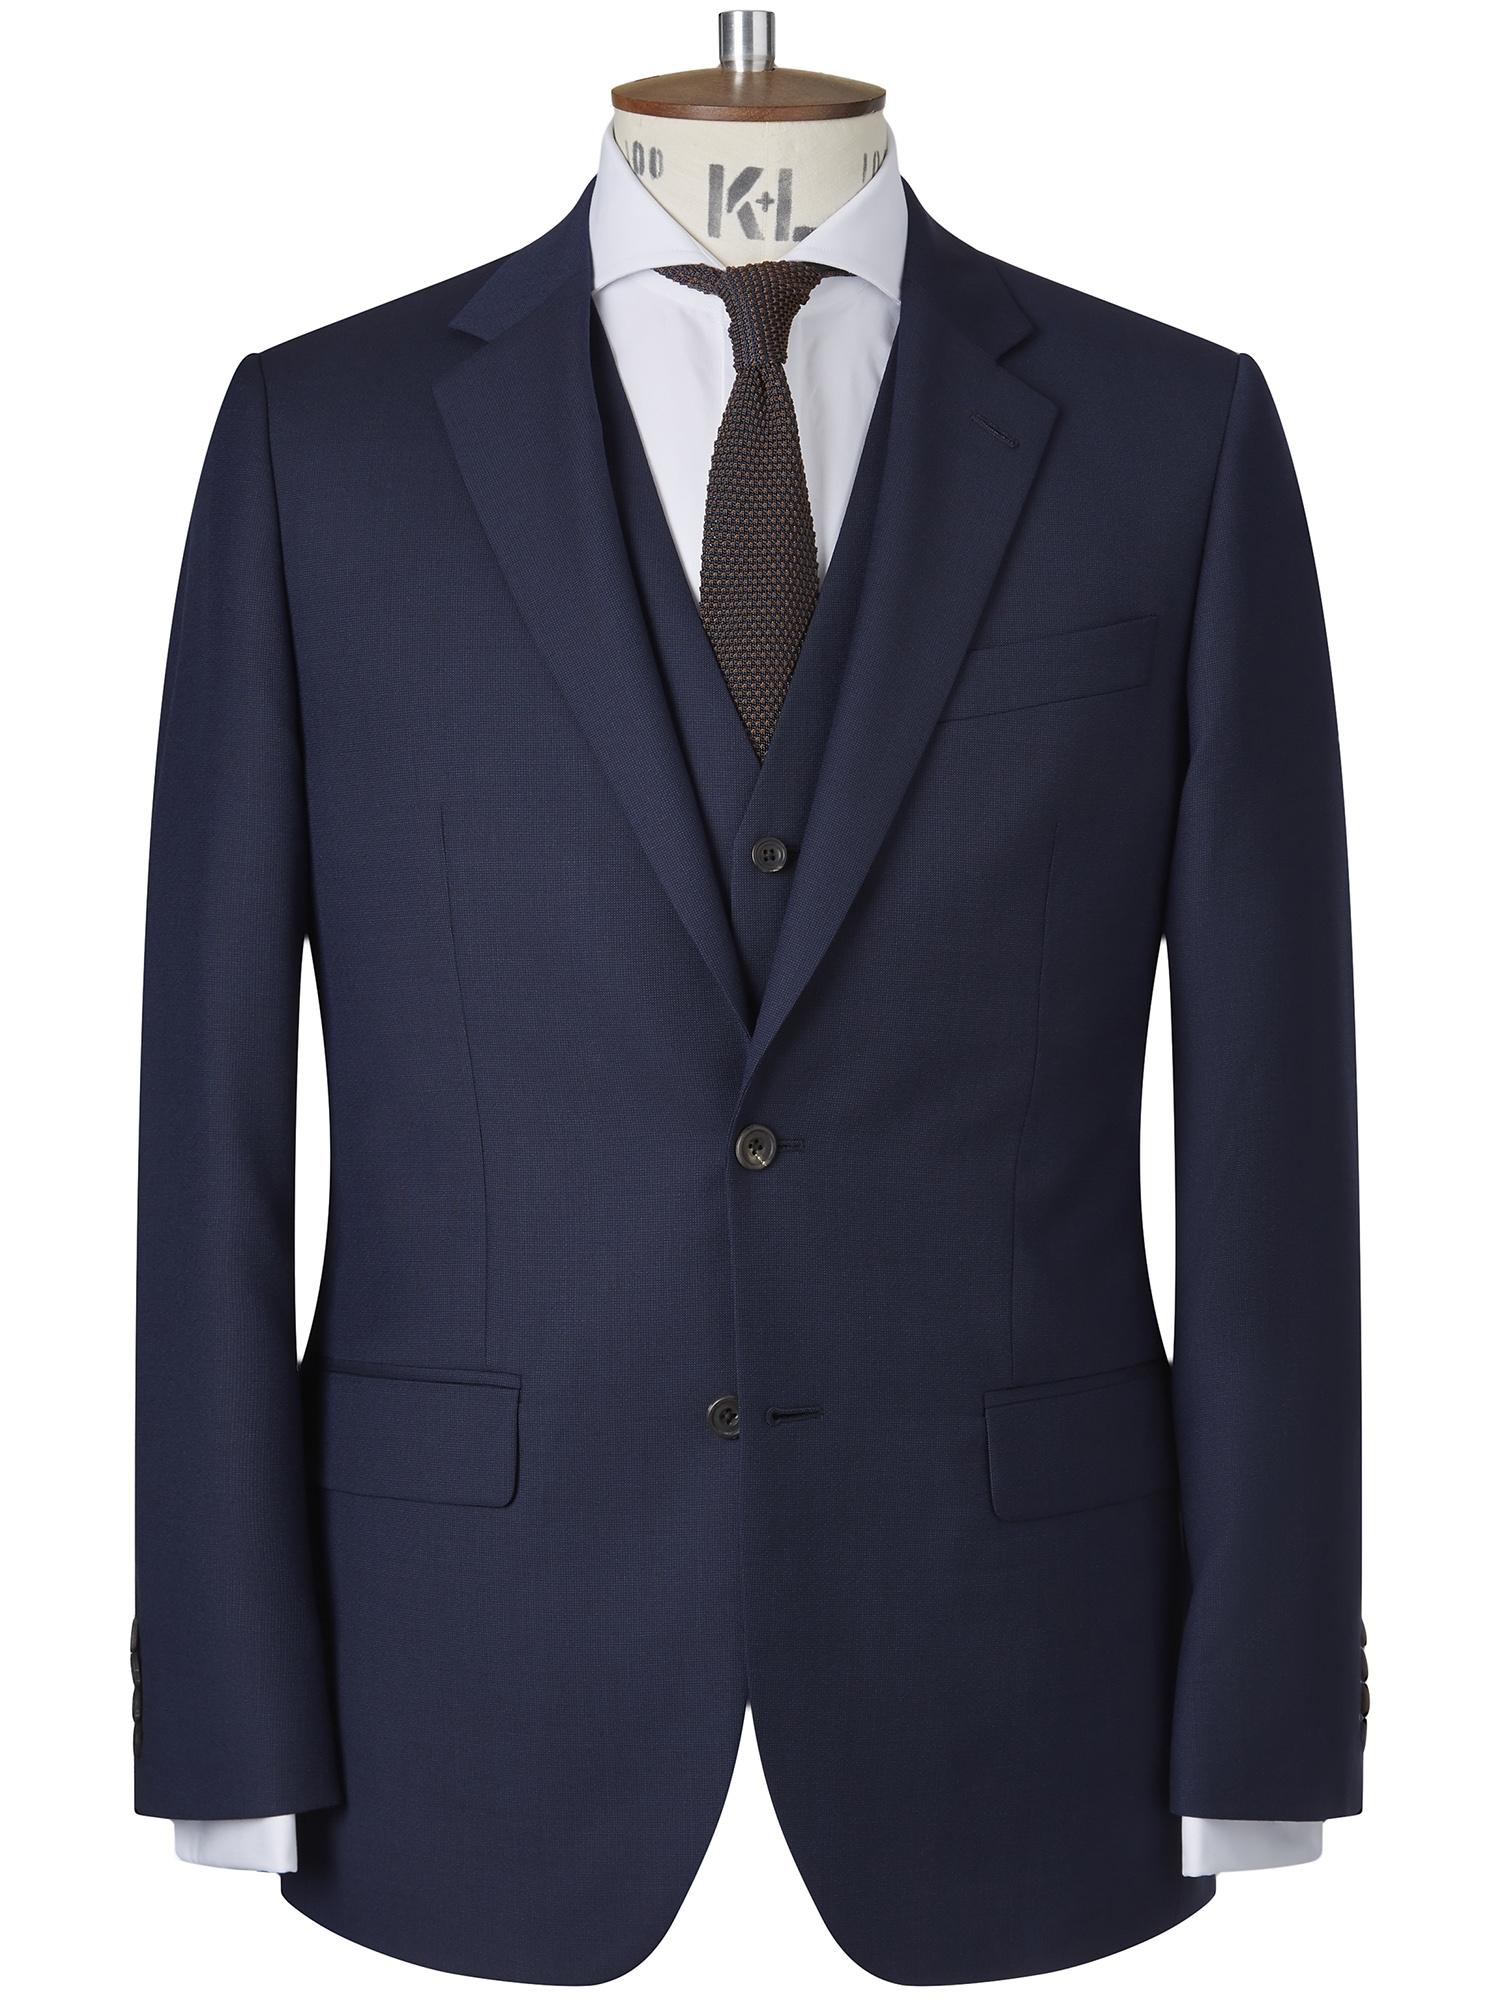 CHESTER BARRIE Fine Pindot Berkeley Suit Jacket